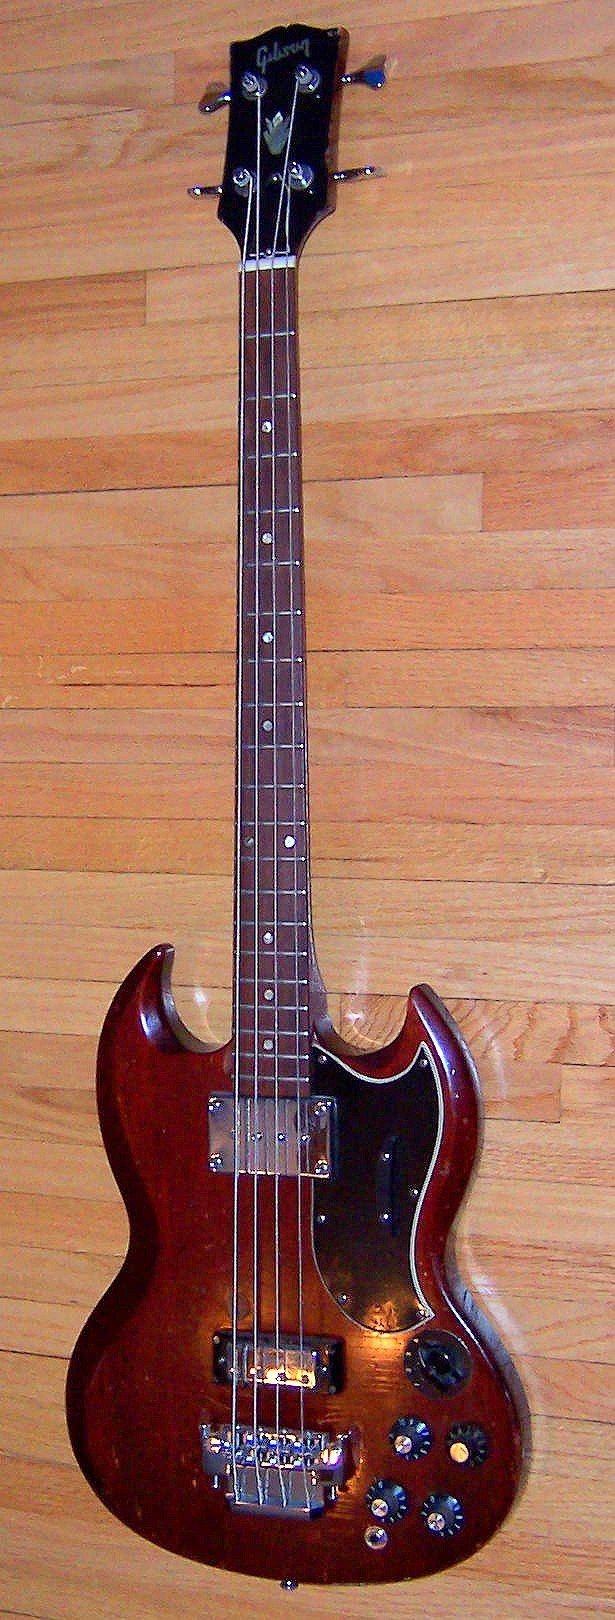 Gibson eb3 67